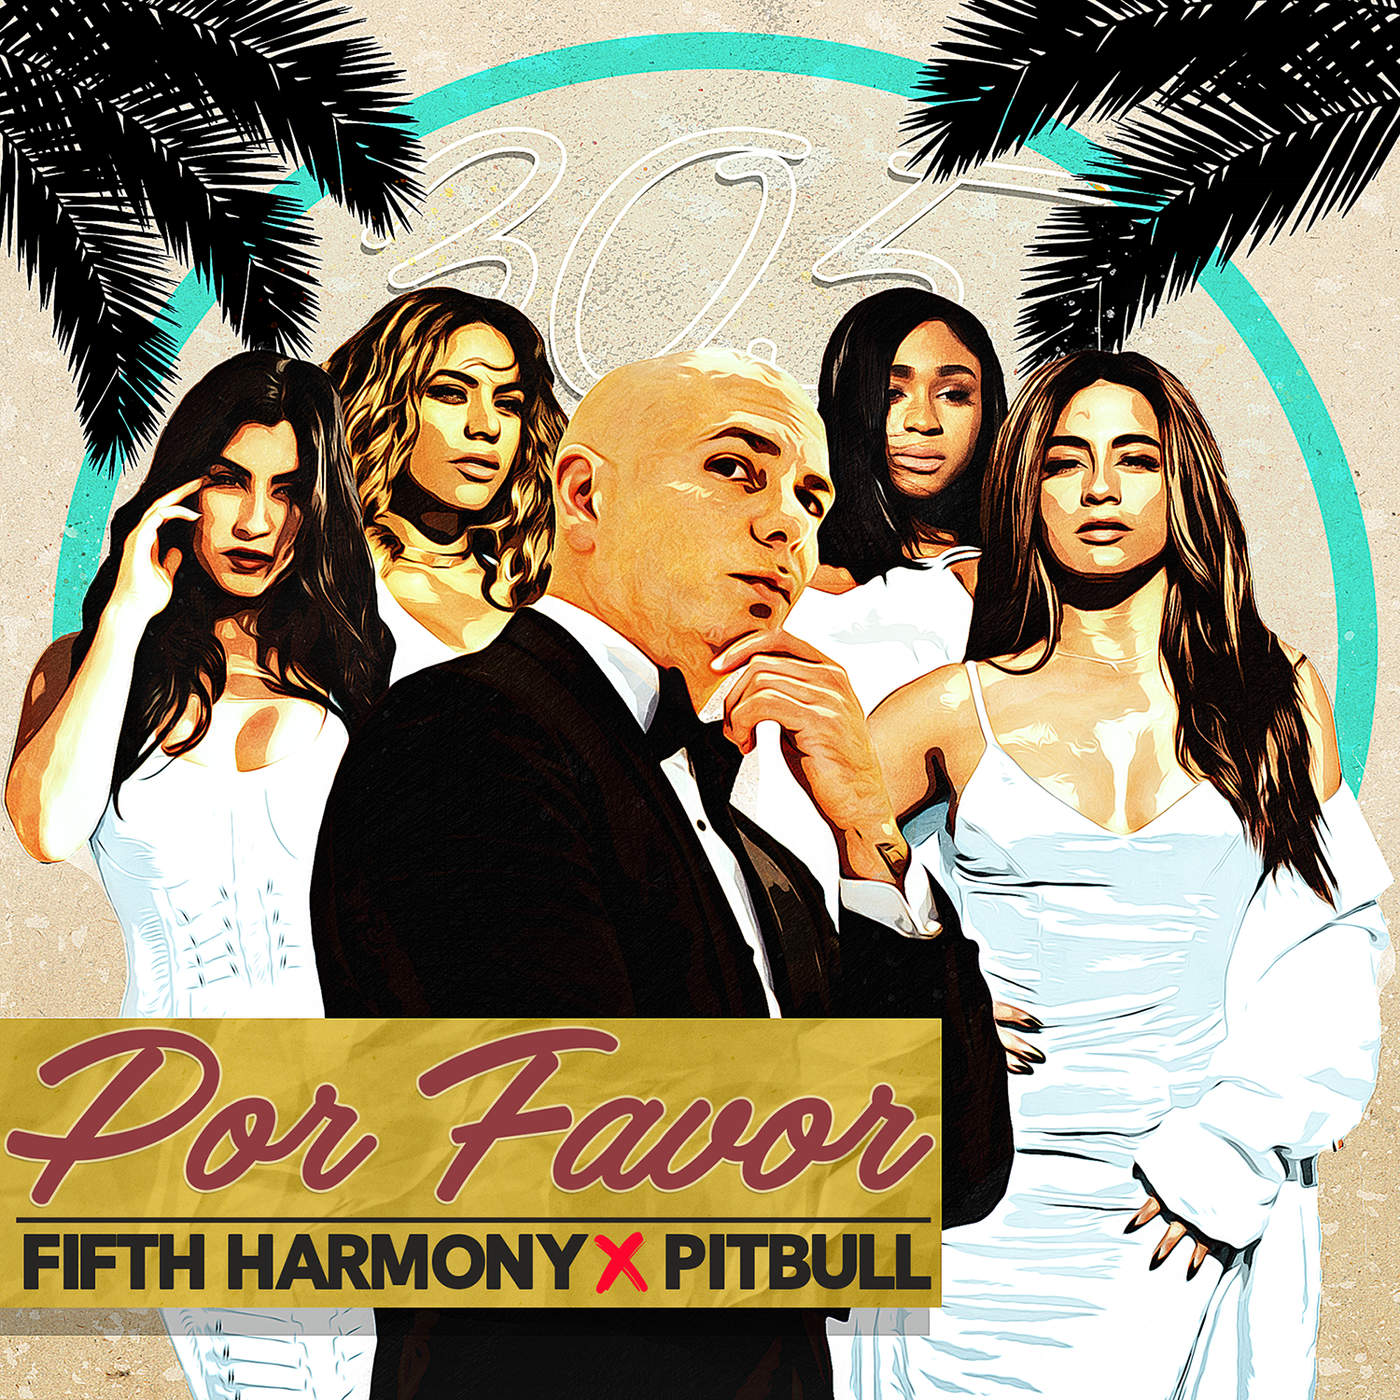 Fifth Harmony & Pitbull - Por Favor (Spanglish Version) - Single